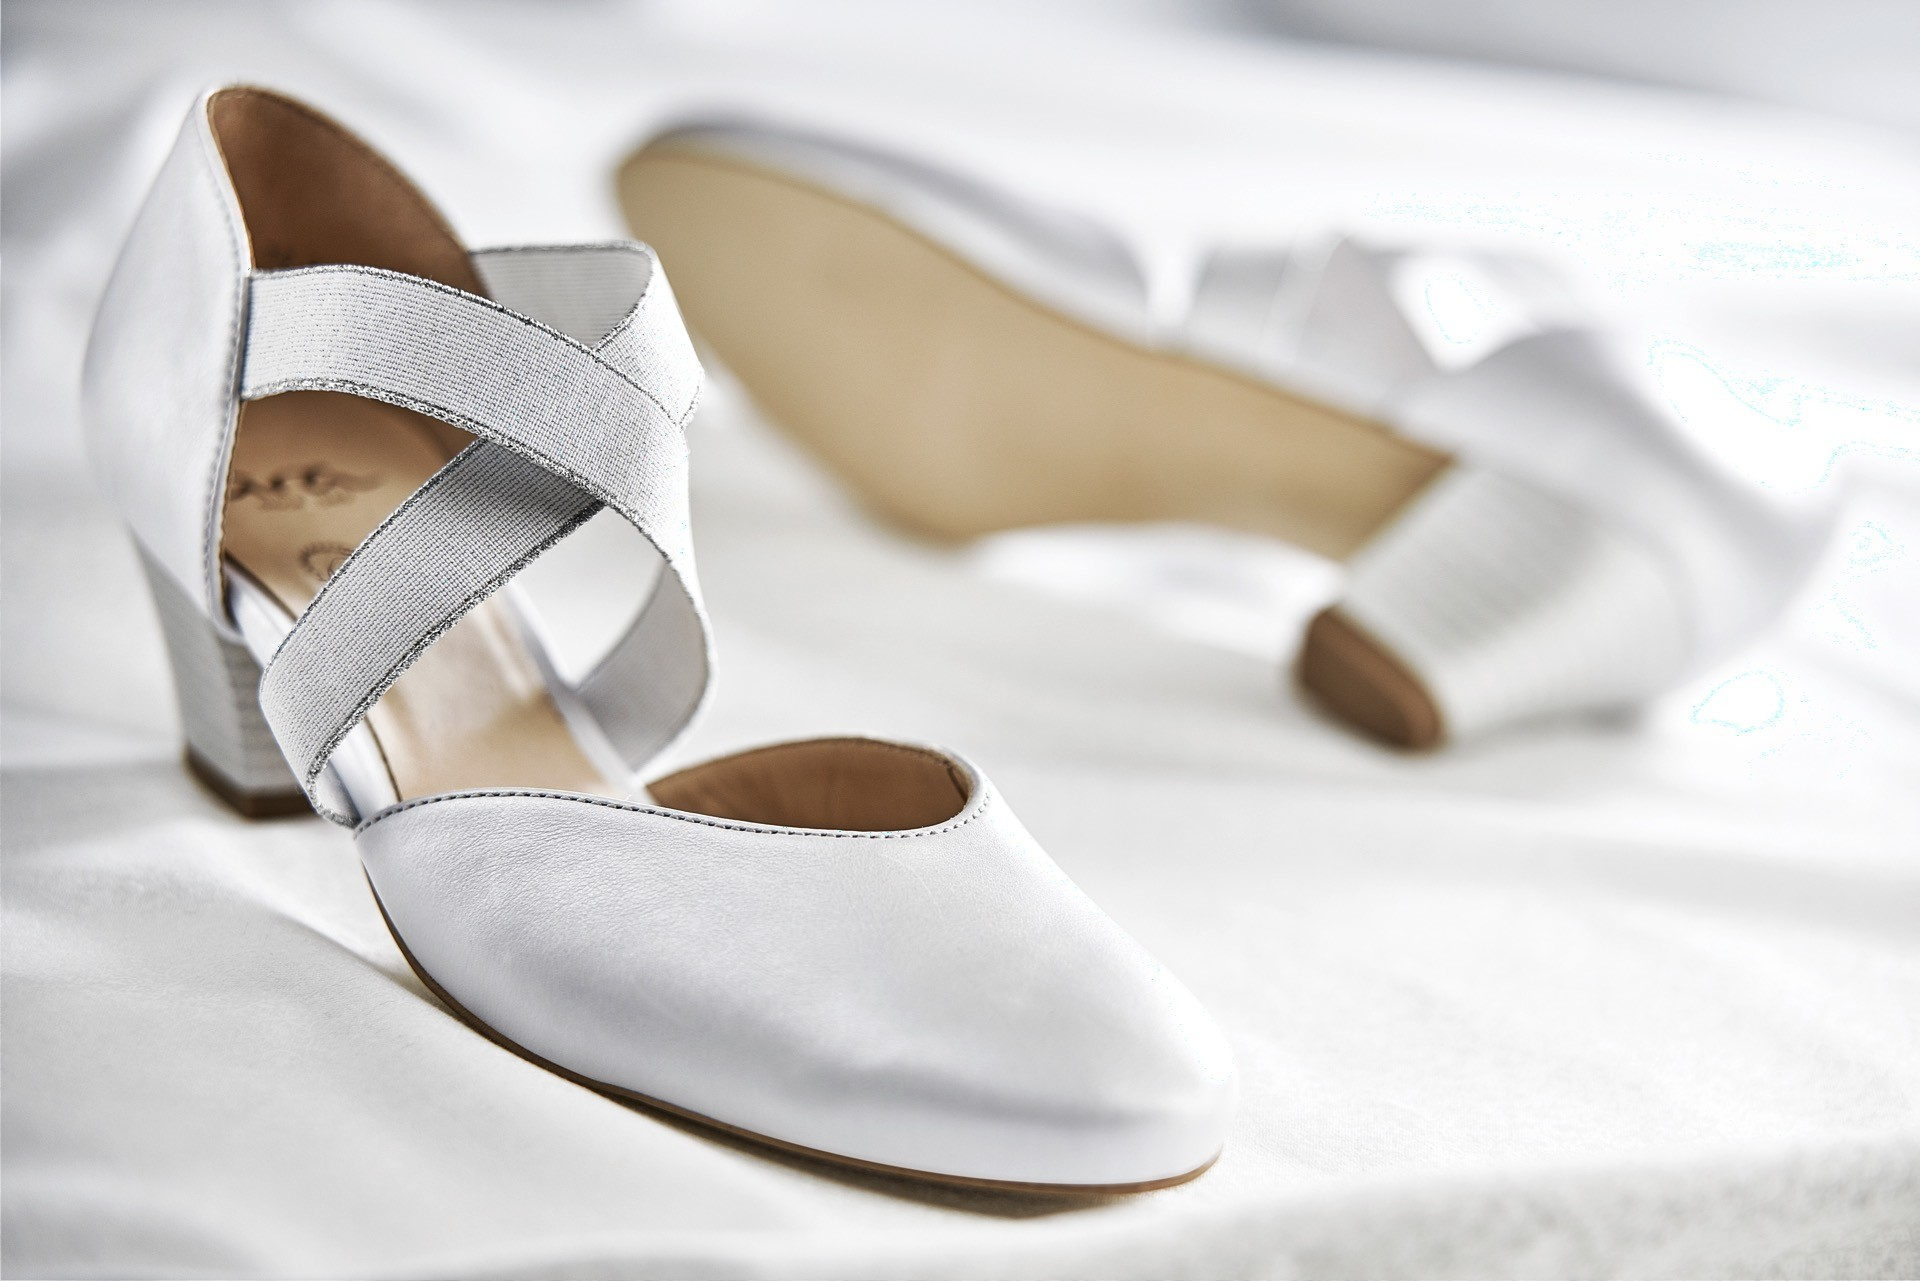 Brautschuhmodell Toulouse von ara Shoes